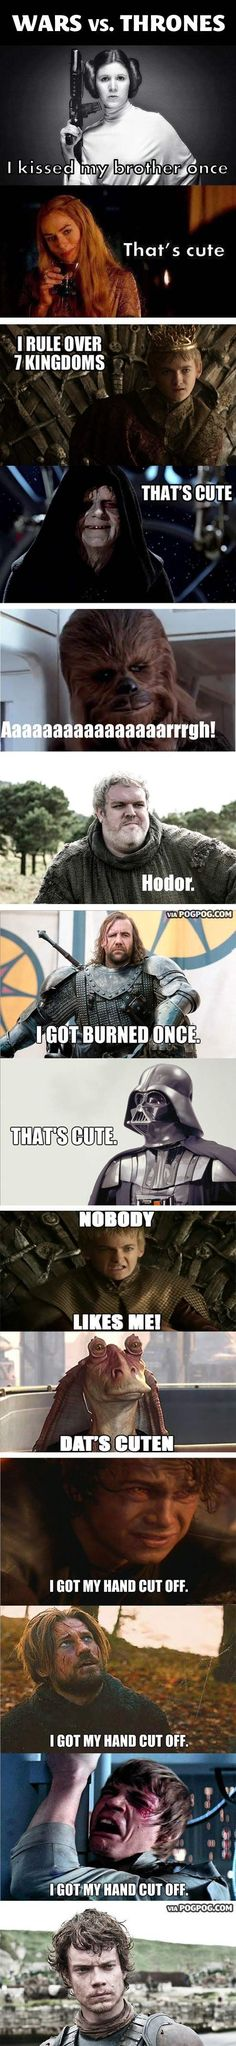 Game Of Thrones Vs Star Wars